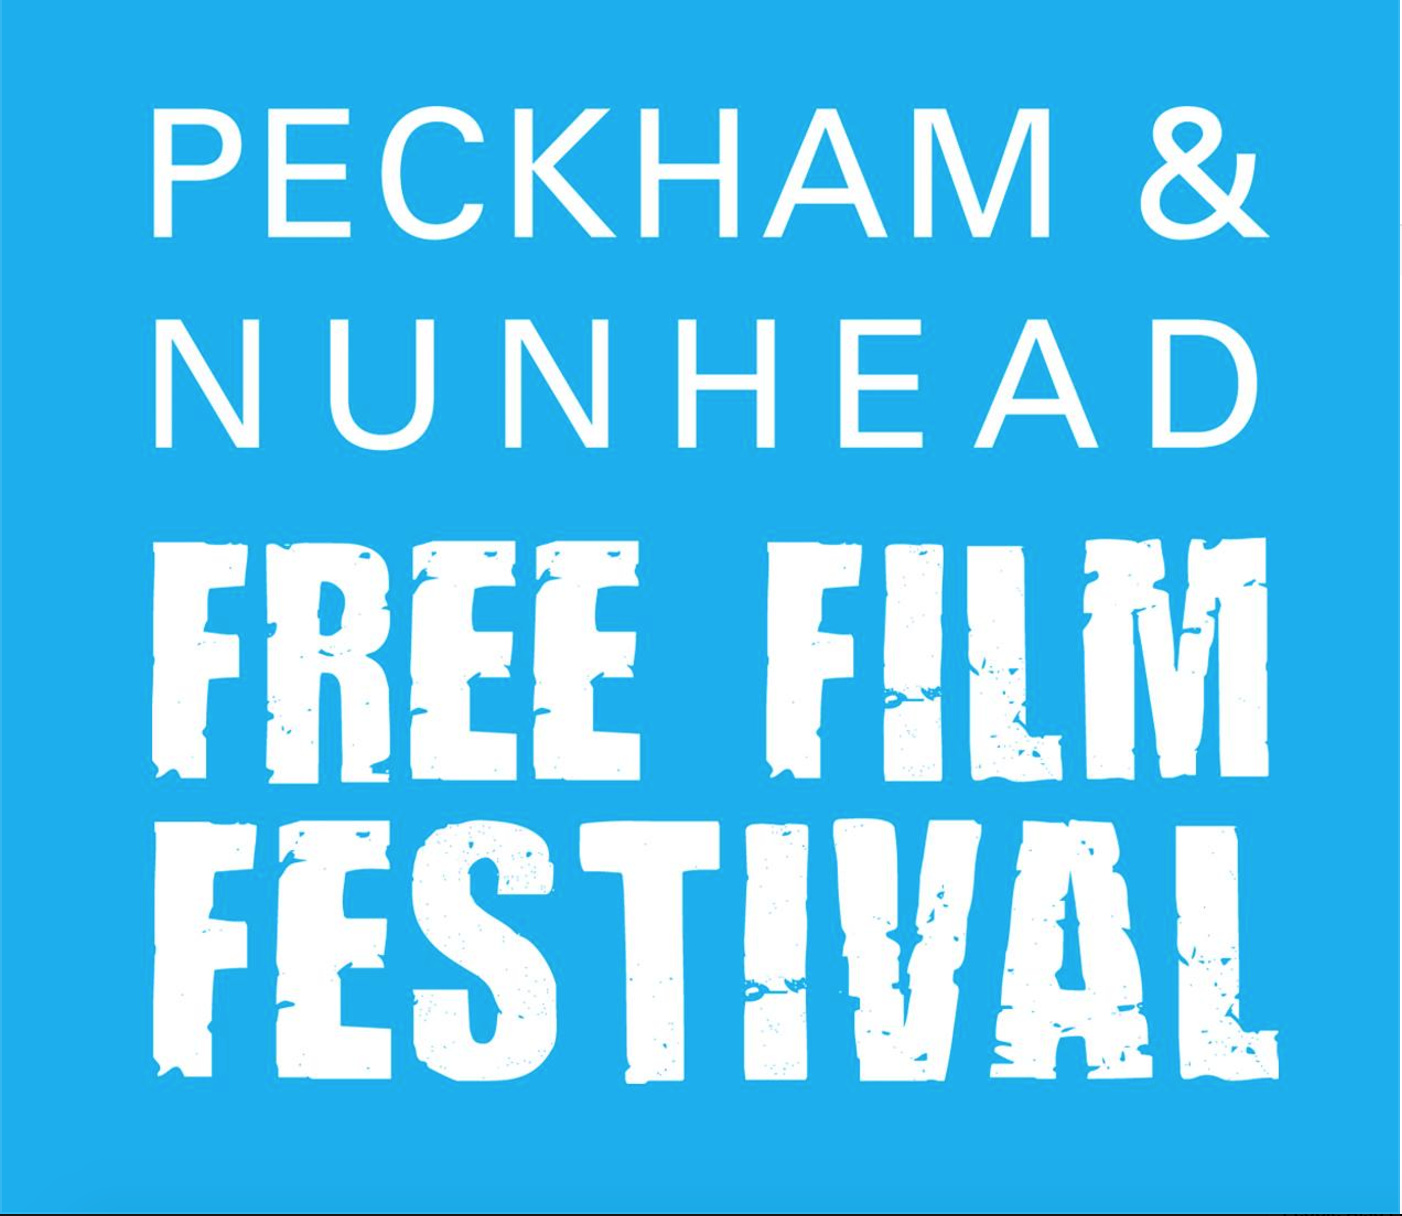 Peckham and Nunhead free film festival